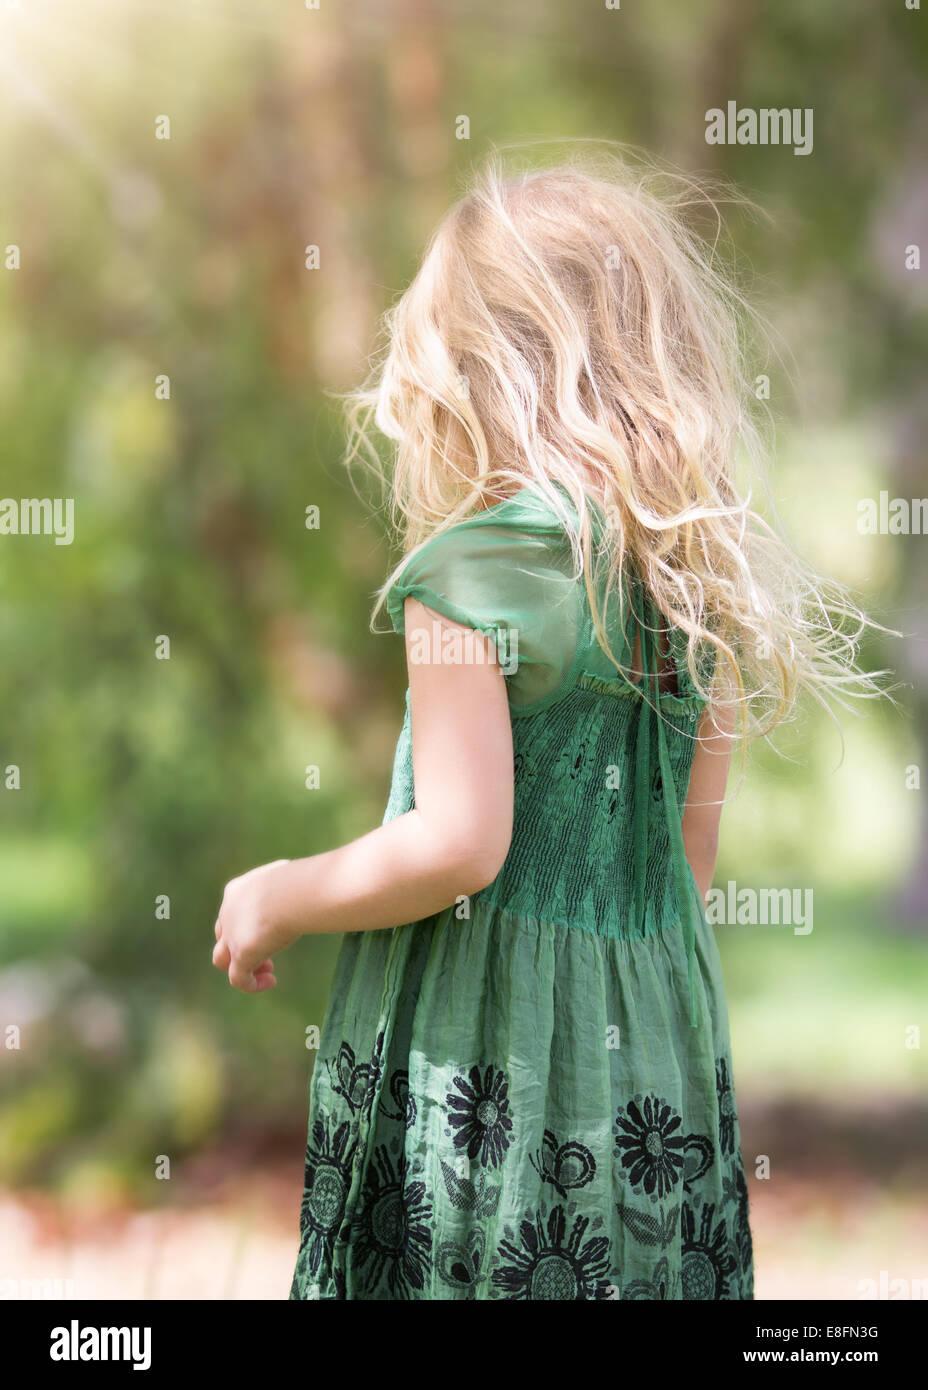 Vue arrière du girl (4-5) wearing green dress Photo Stock